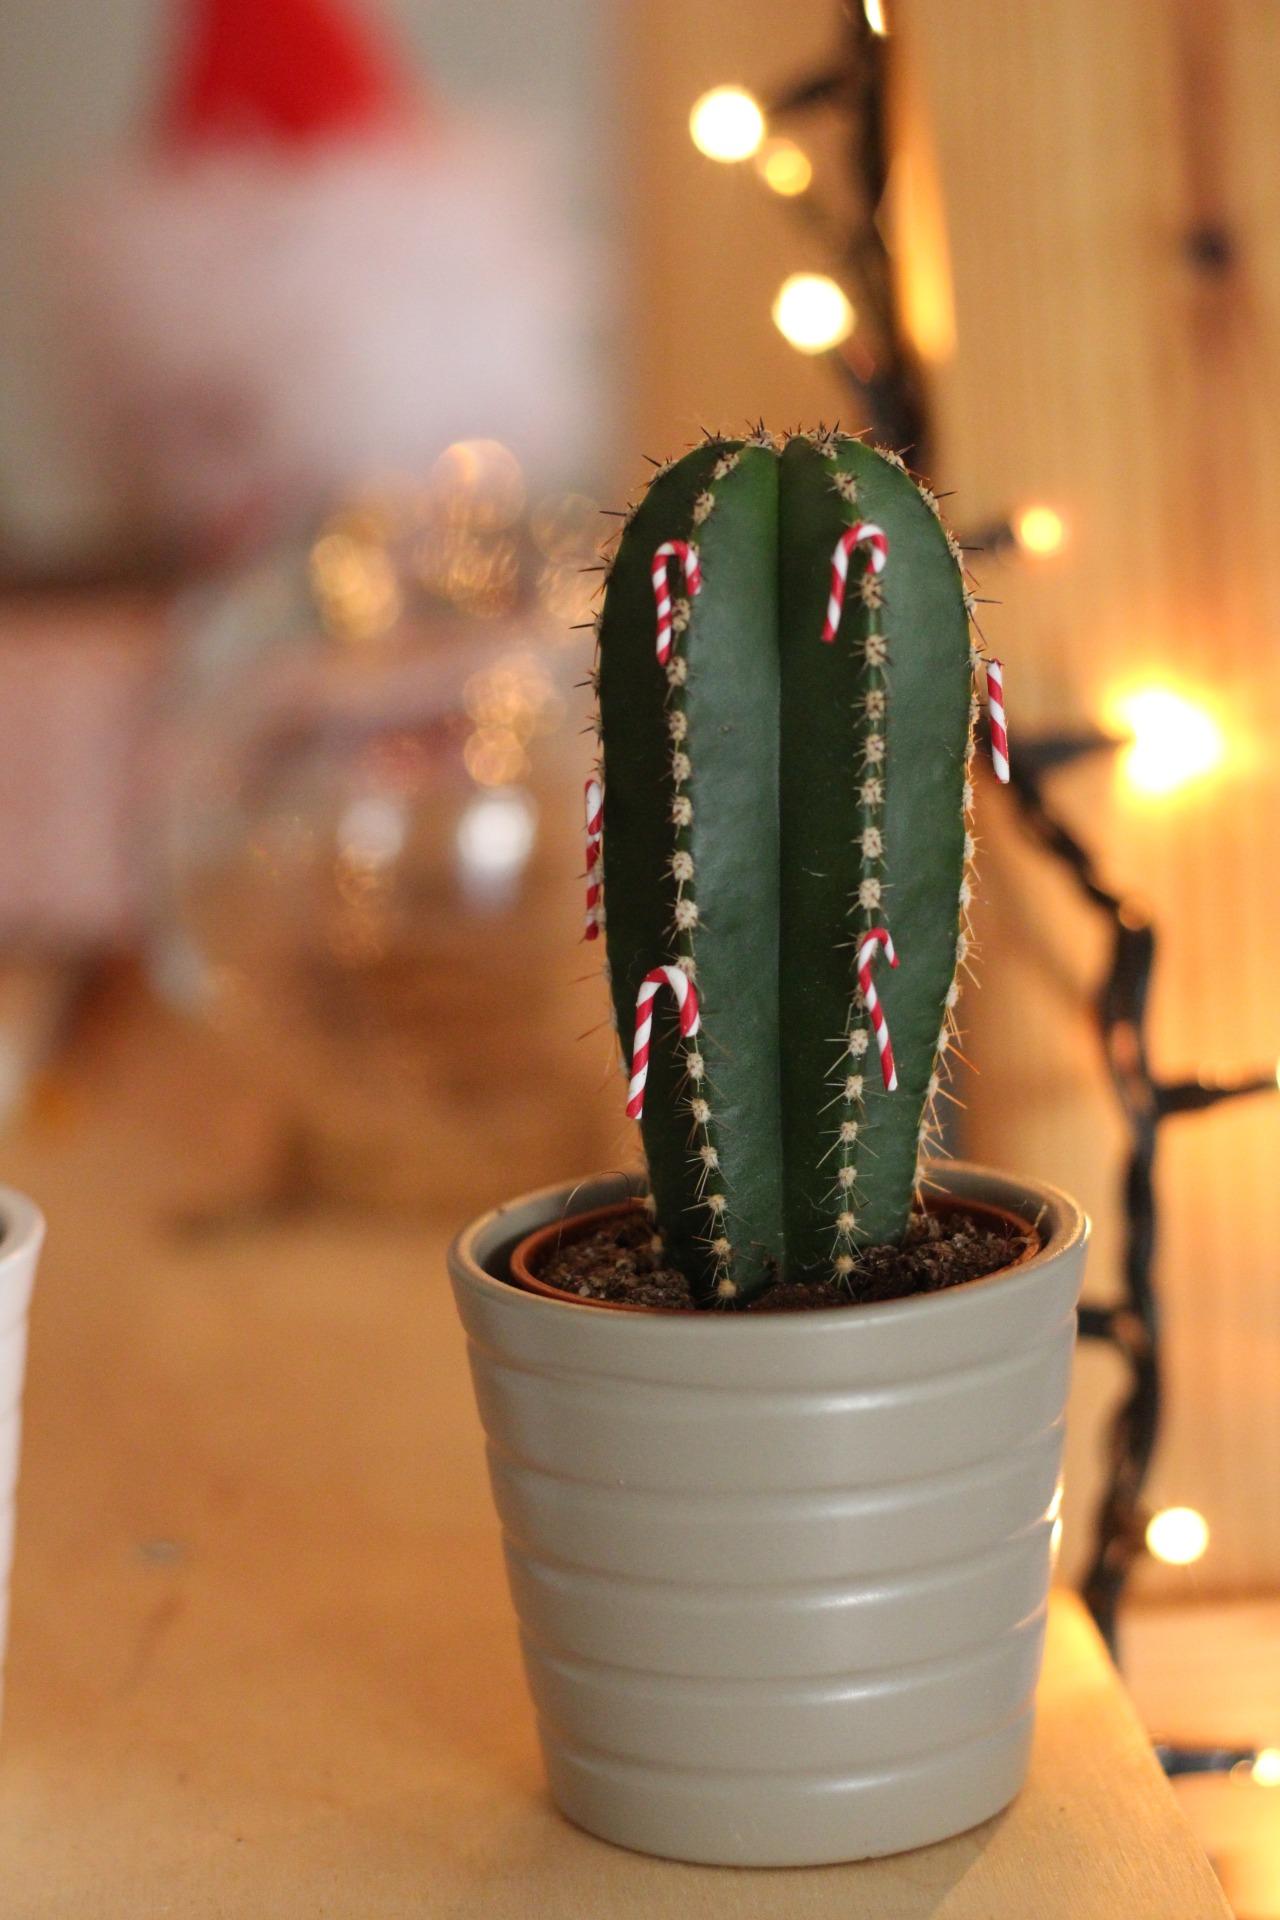 DIY Cactus Ornaments